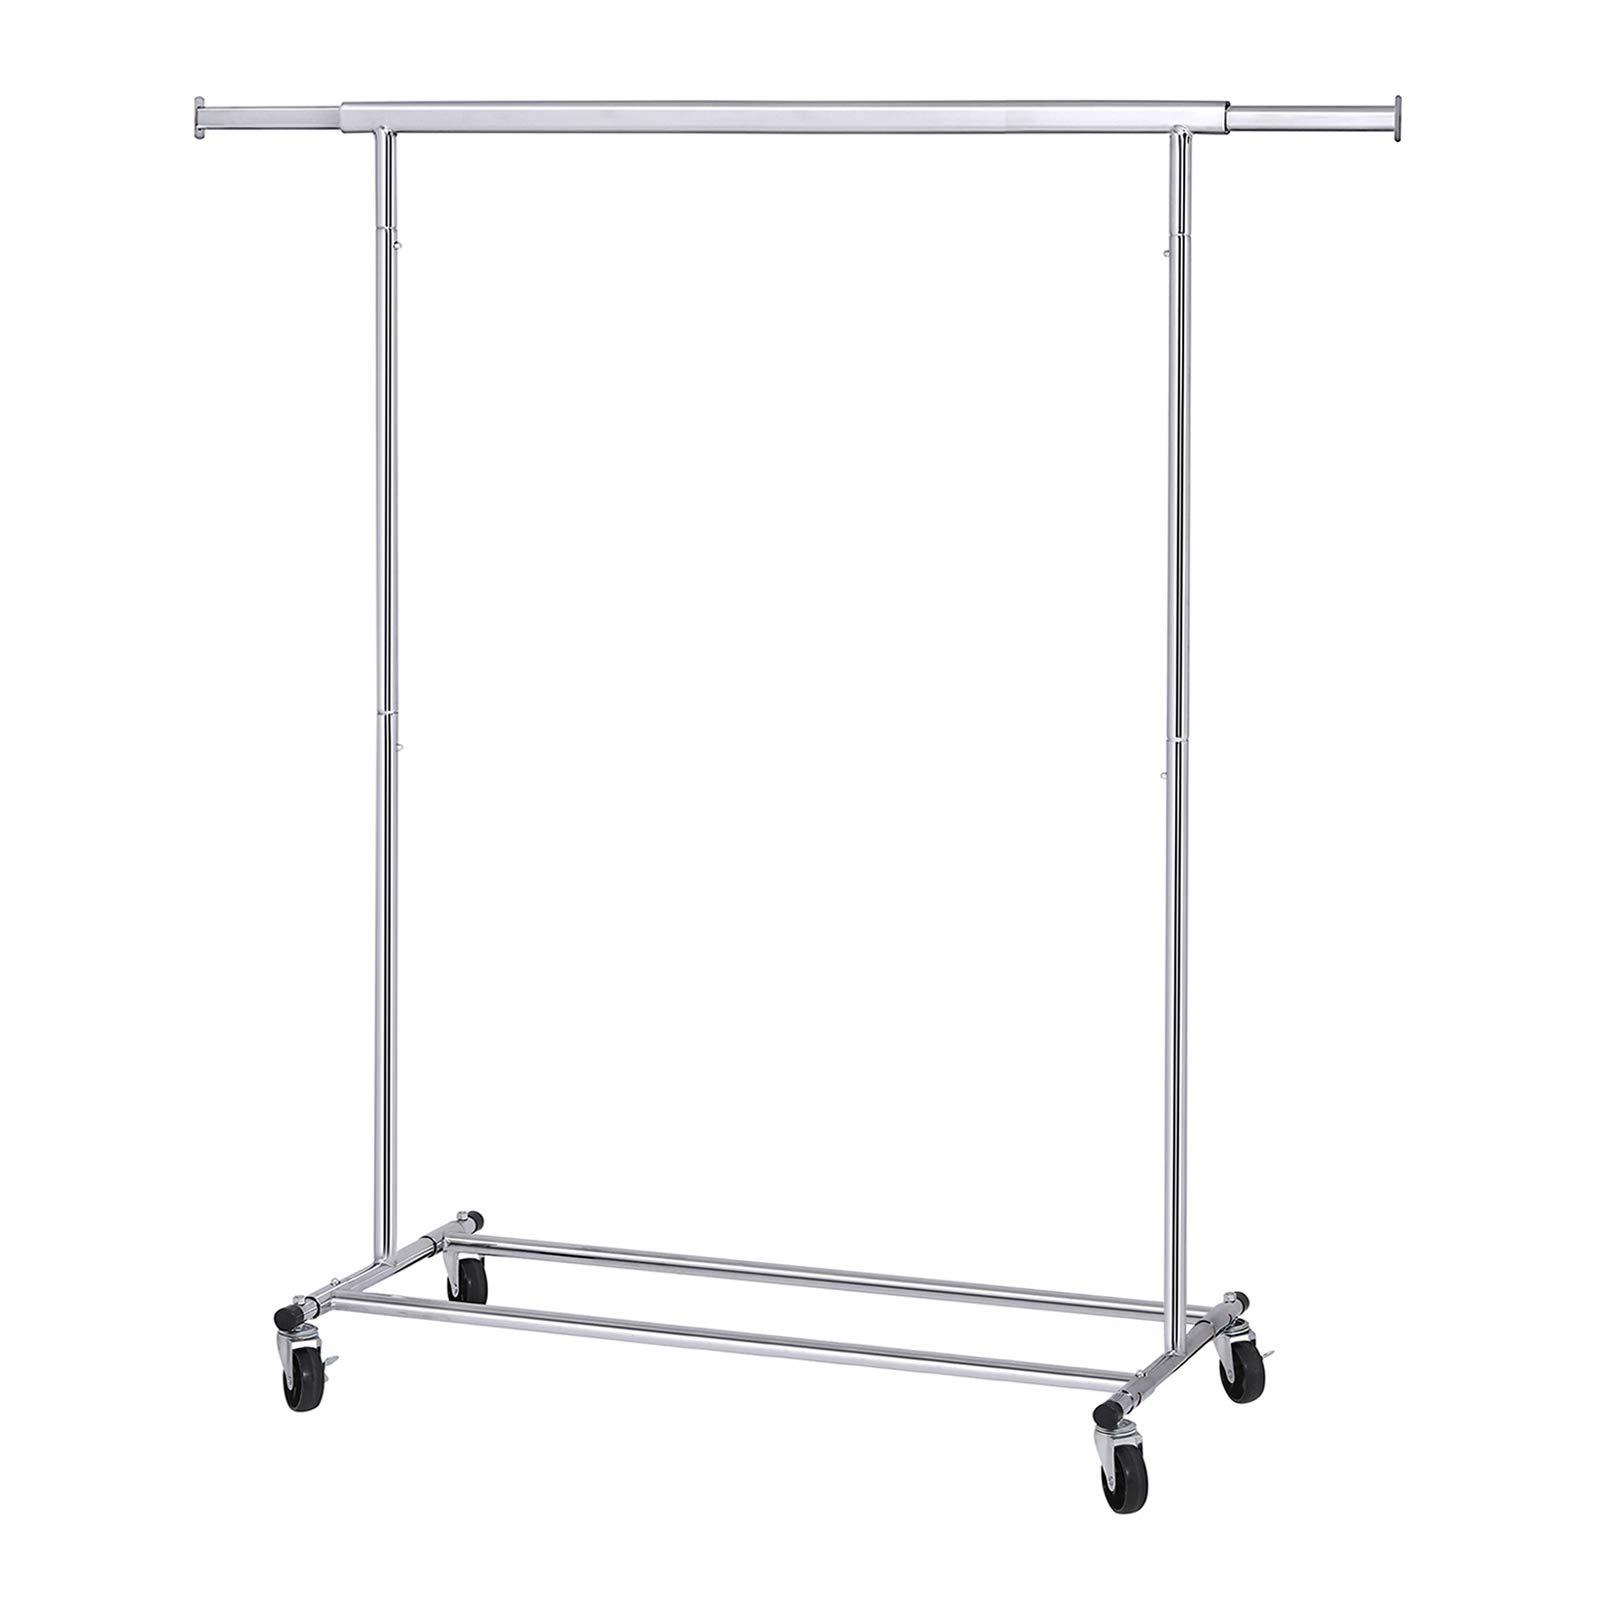 Songmics clothes garment rack with shelf on wheels maximum capacity 198 41lbs heavy duty clothing rack